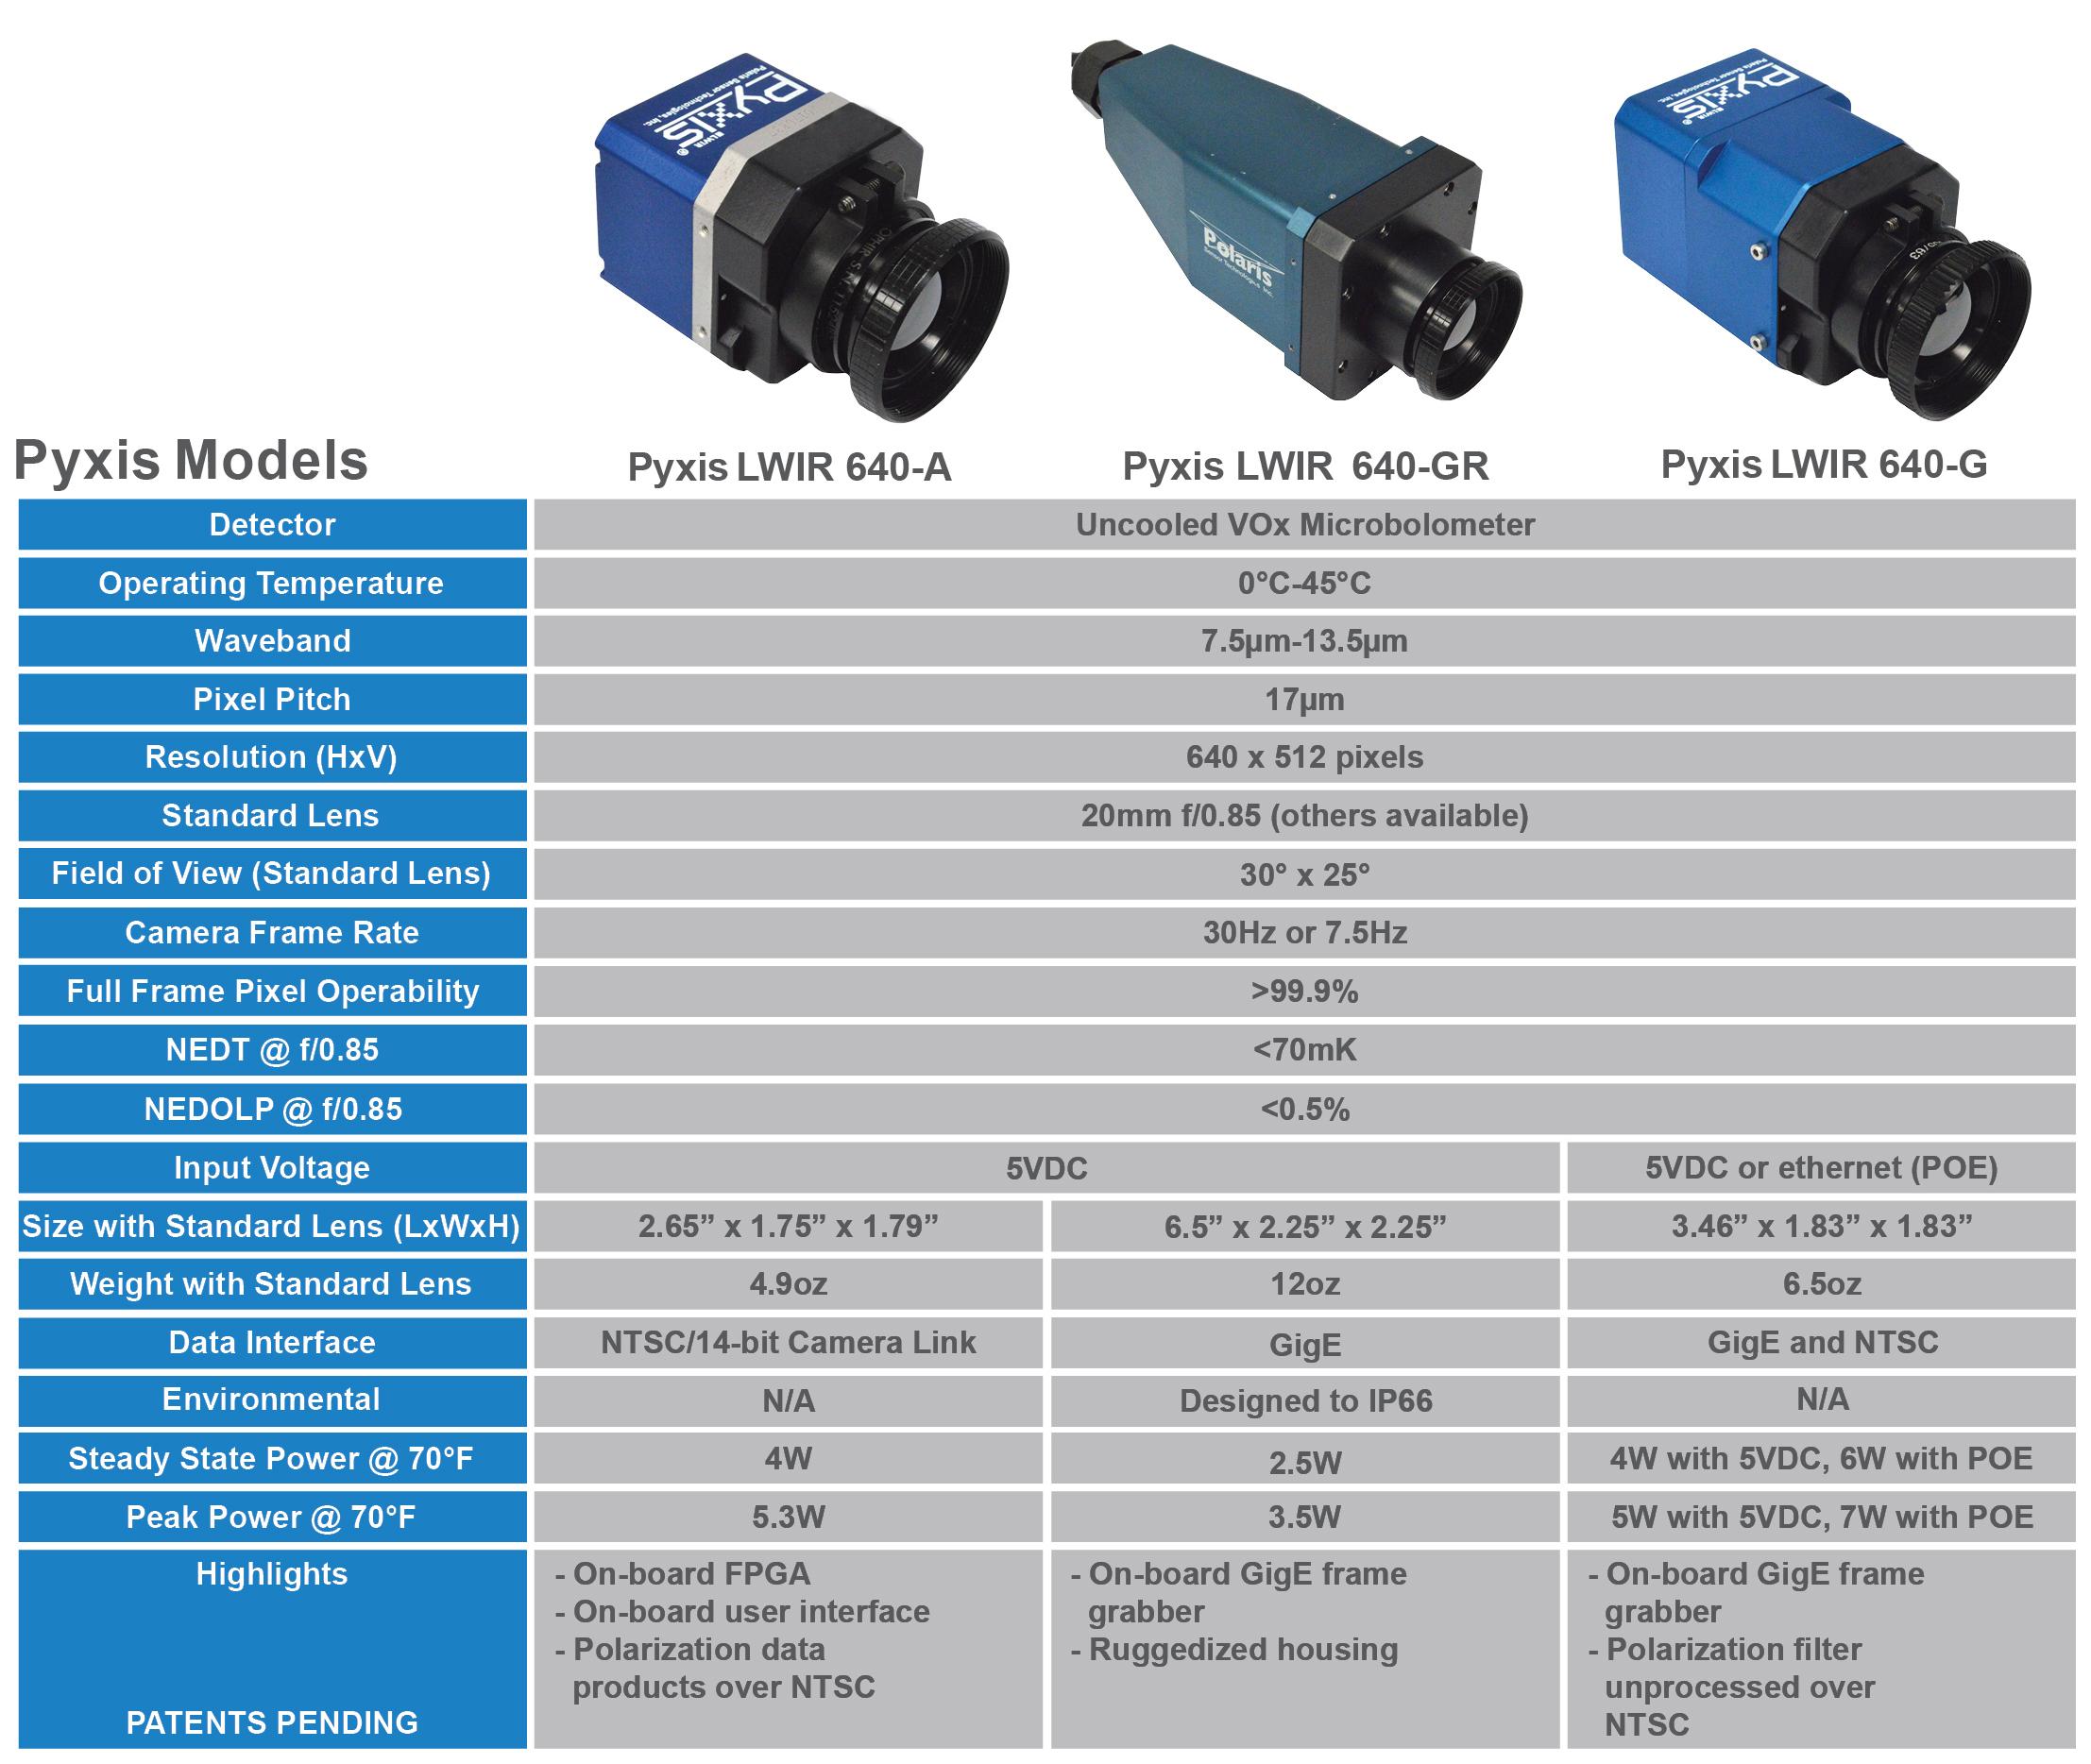 Pyxis Models